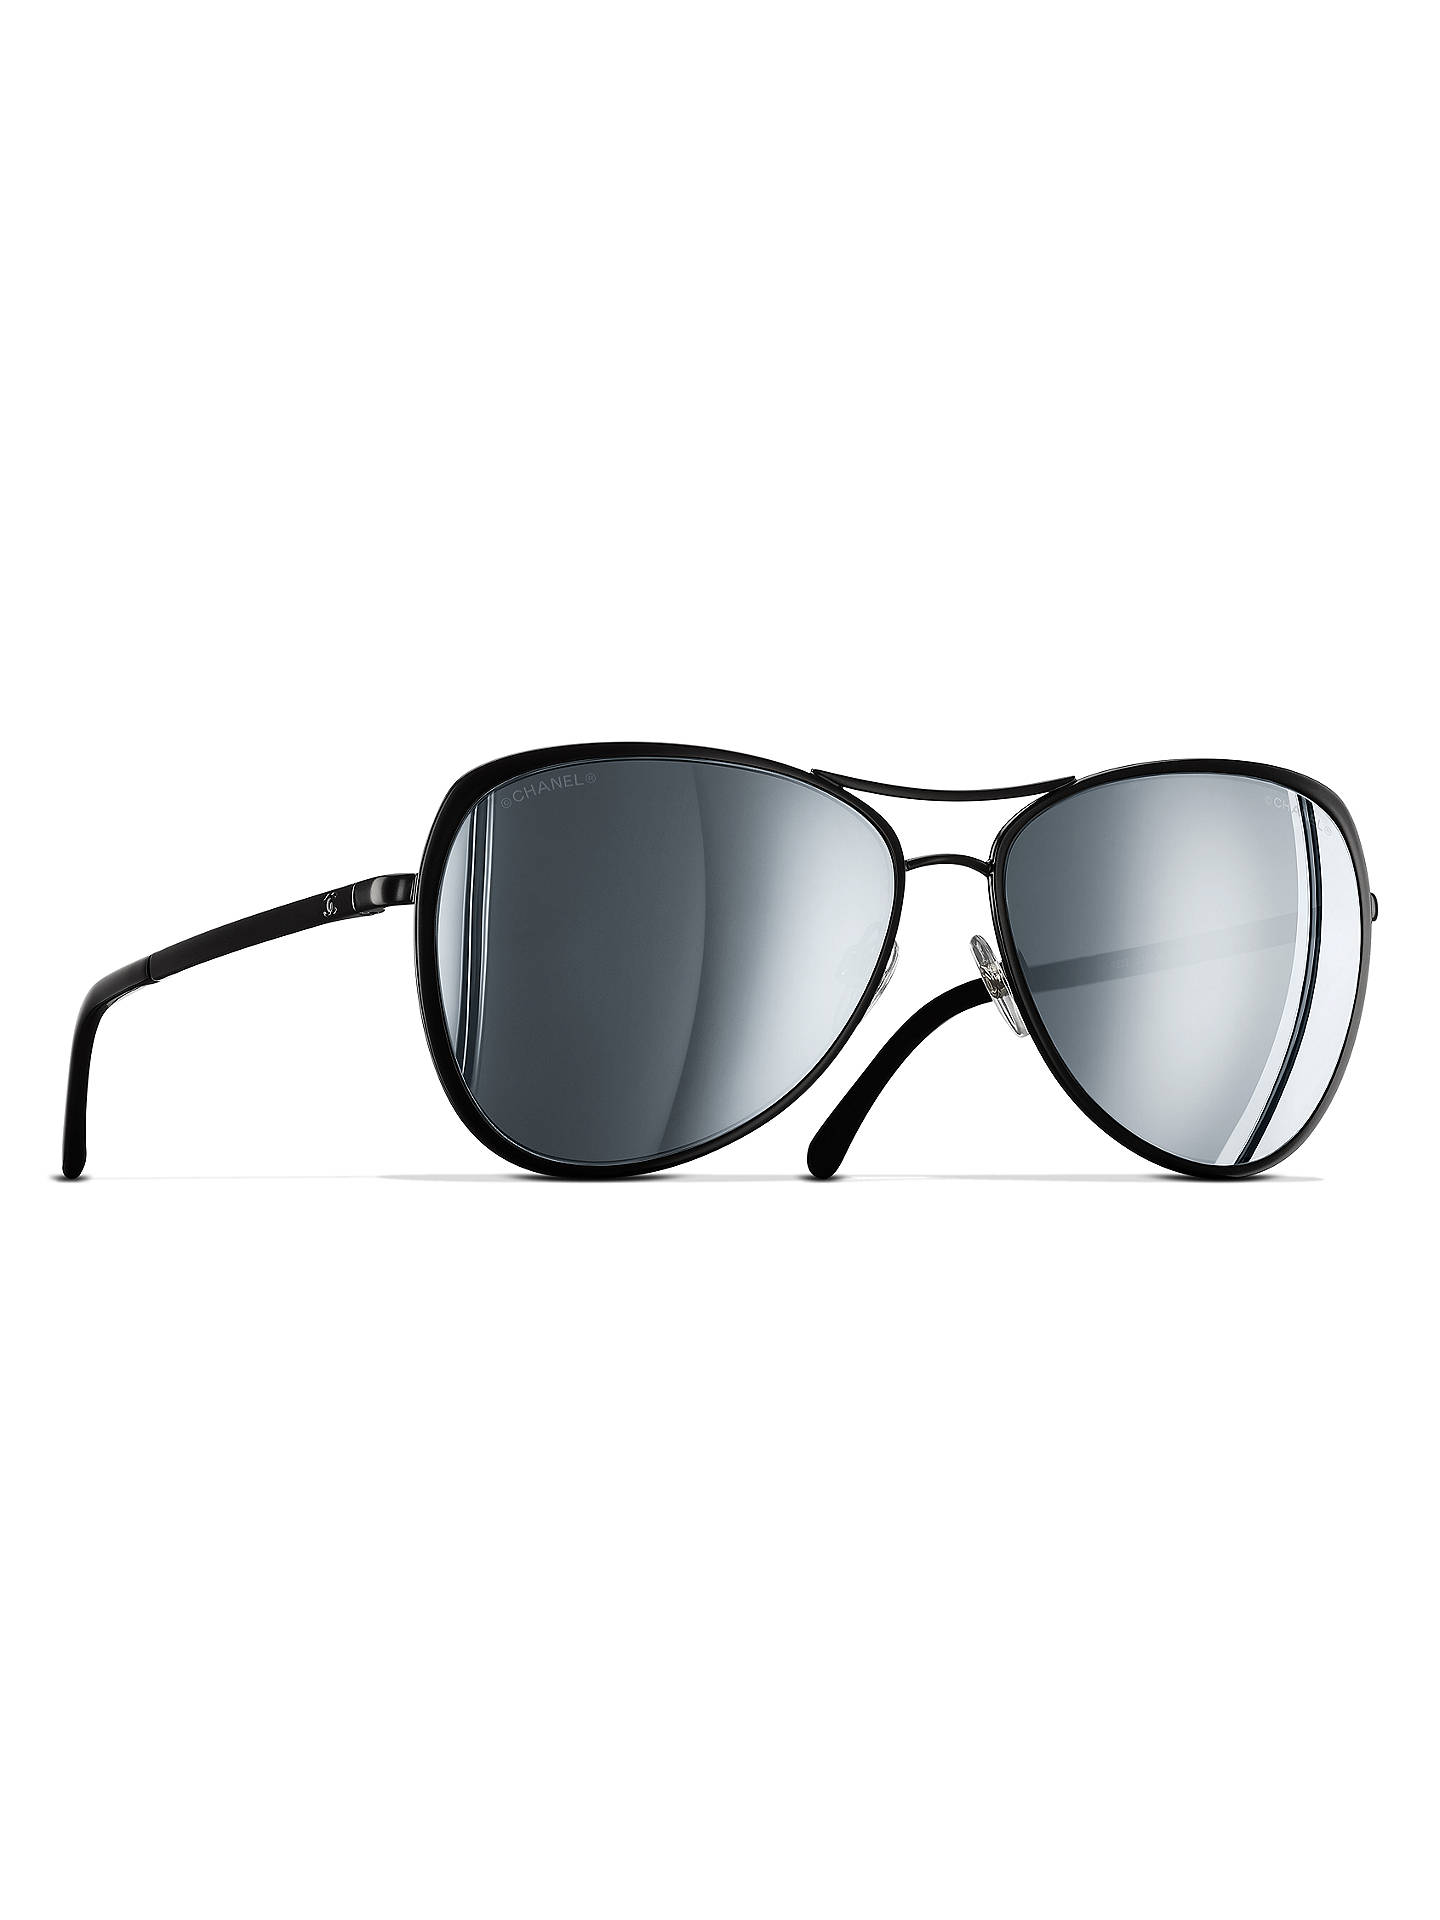 BuyCHANEL Pilot Sunglasses CH4223 Black Online at johnlewis.com ... 839e0845154